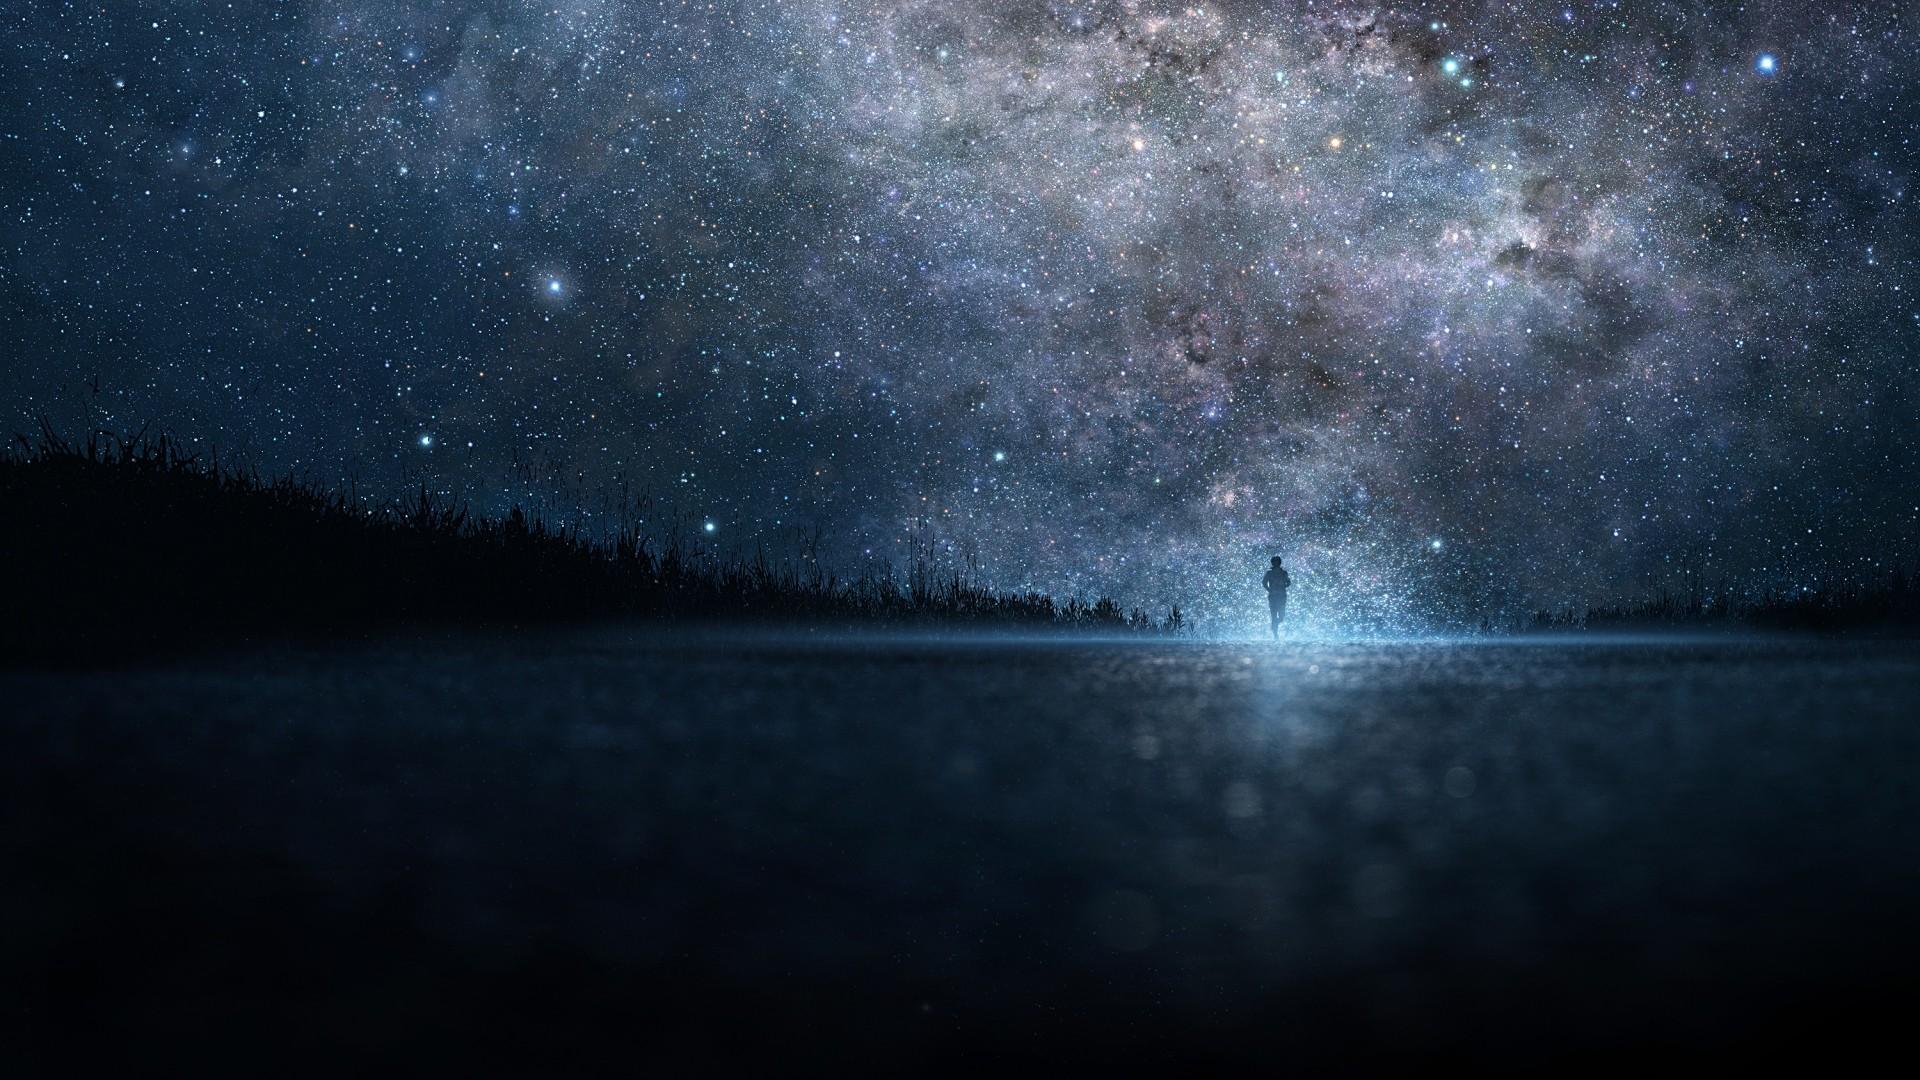 Wallpaper star, art, sky, night, people, silhouette